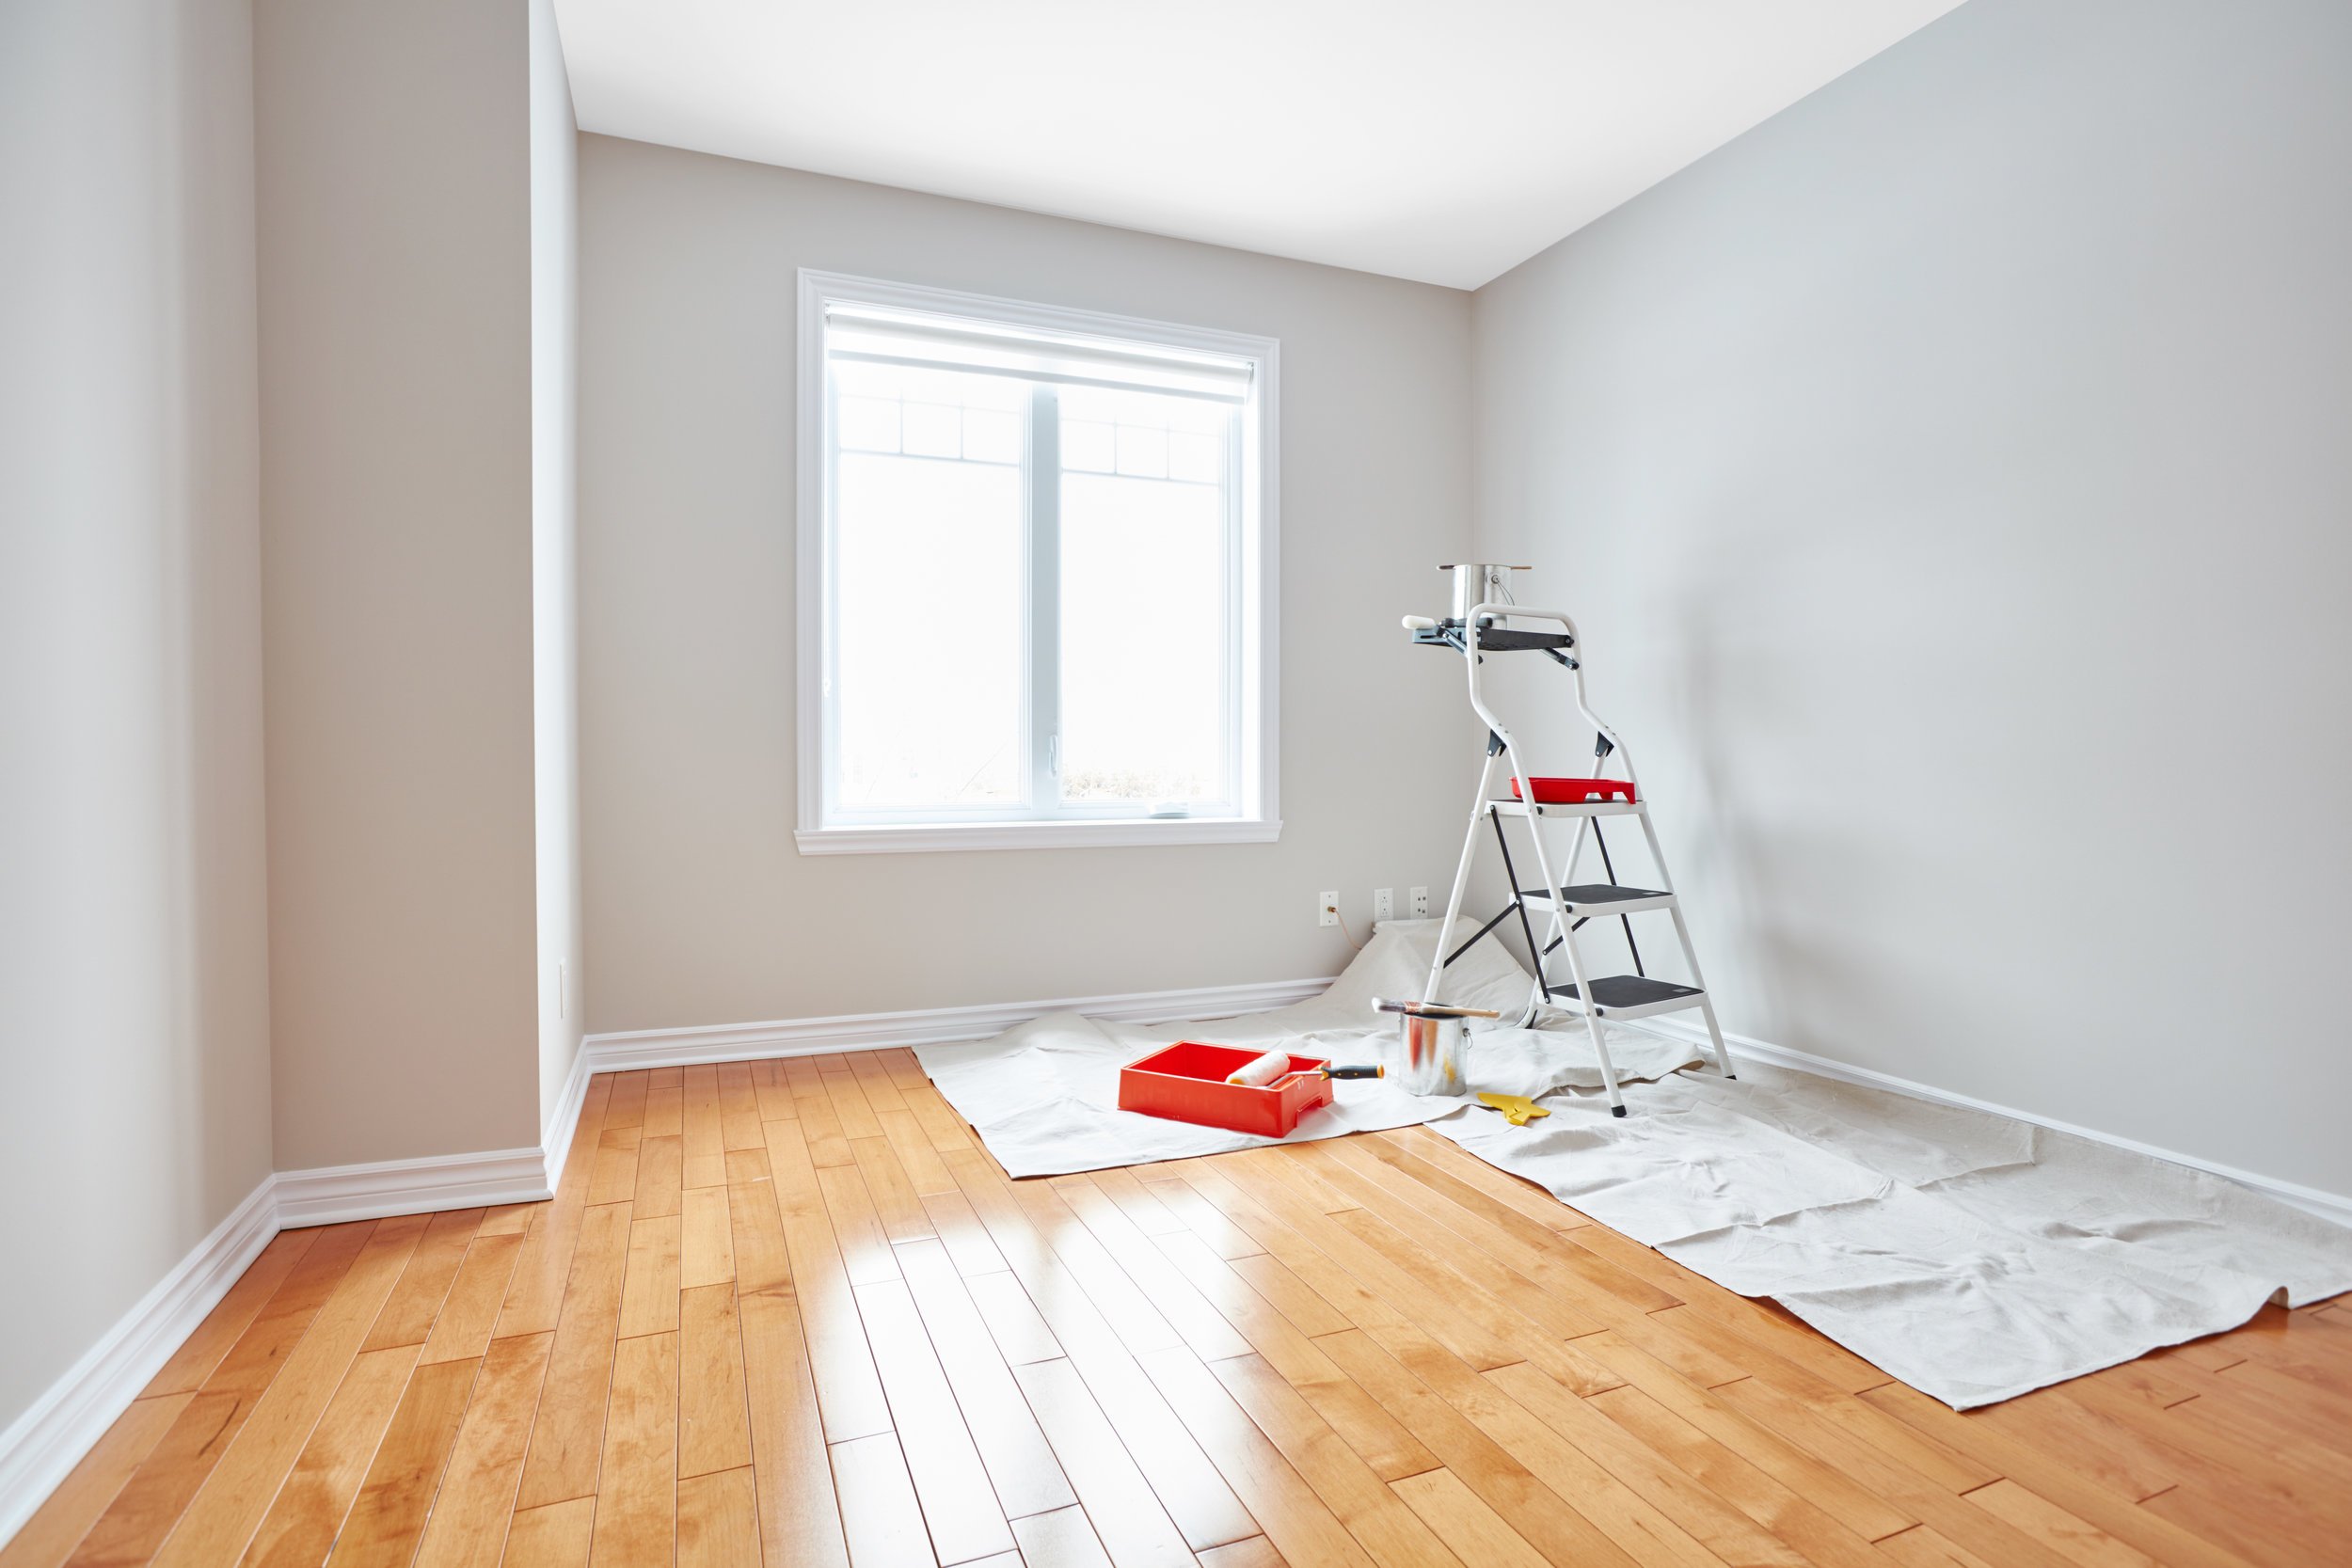 Home Improvement - …………………………………